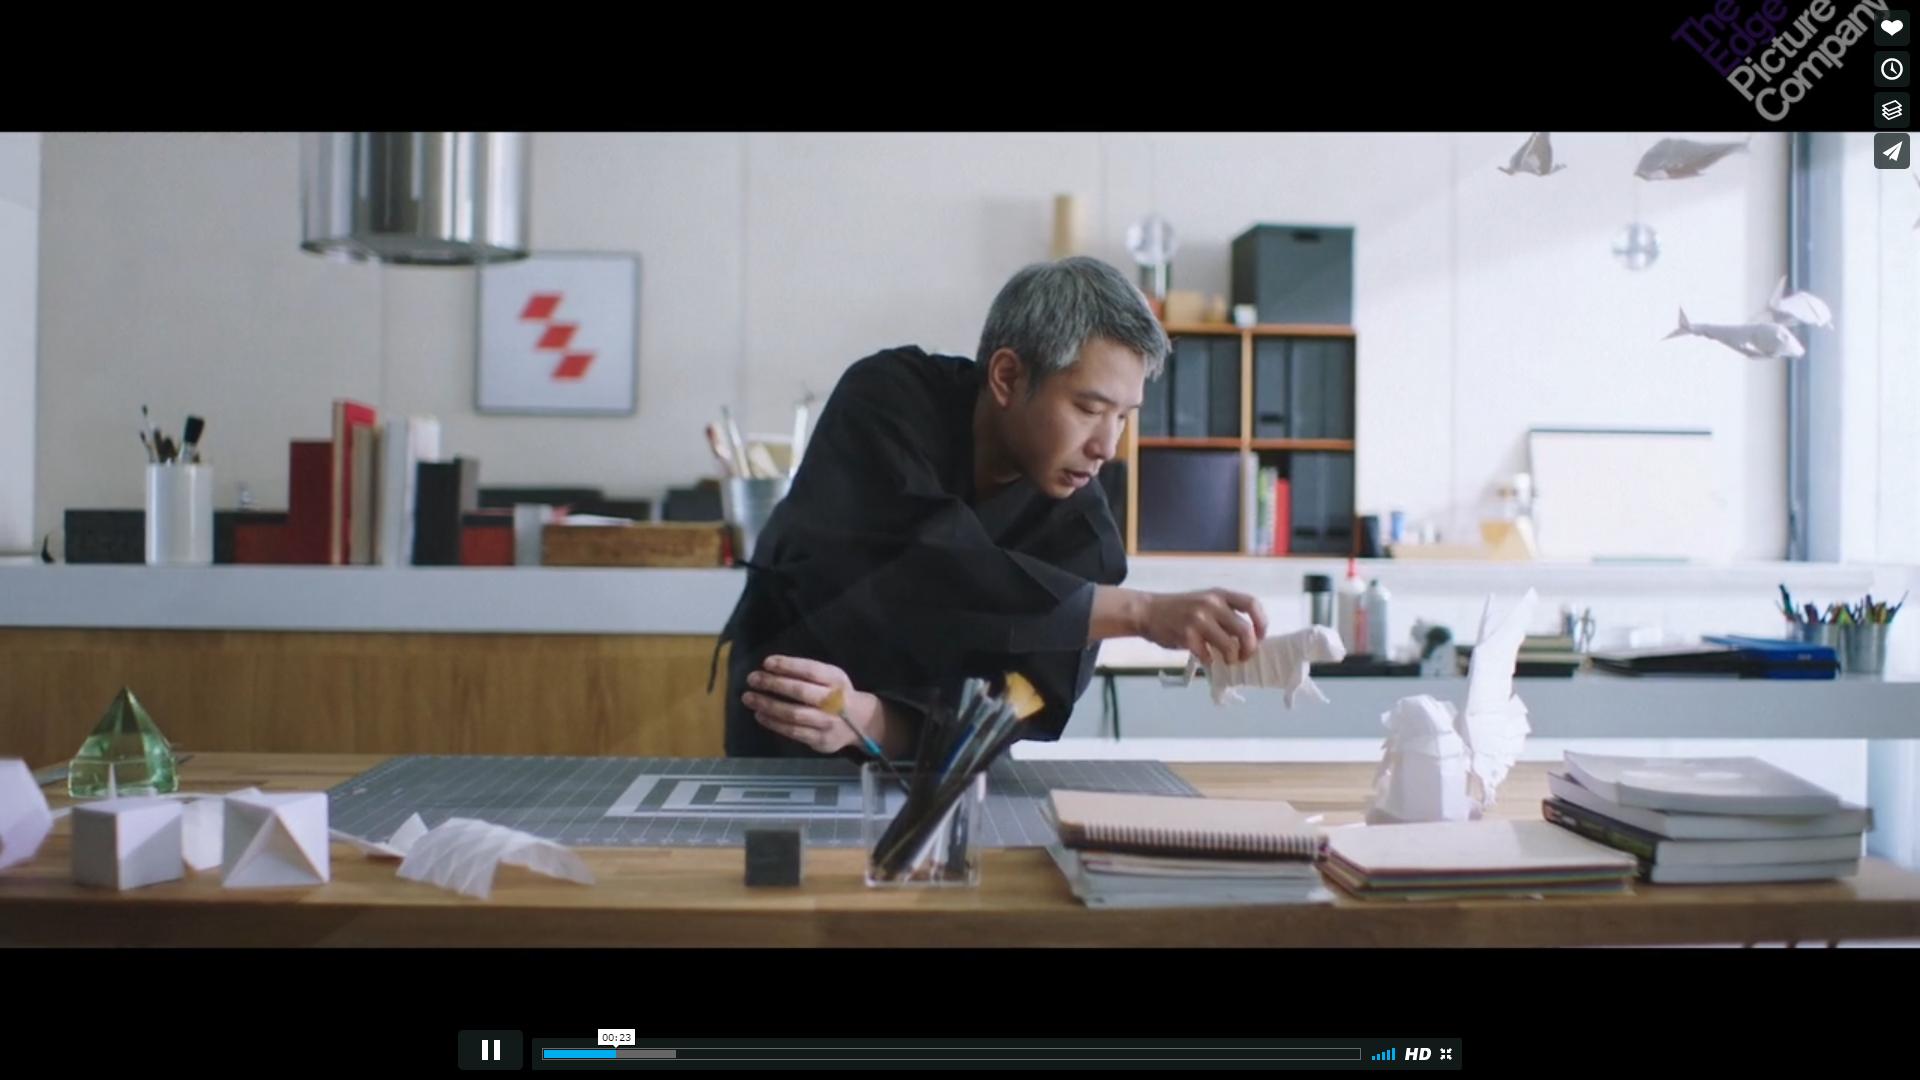 Edge Picture Company // Saudi Aramco